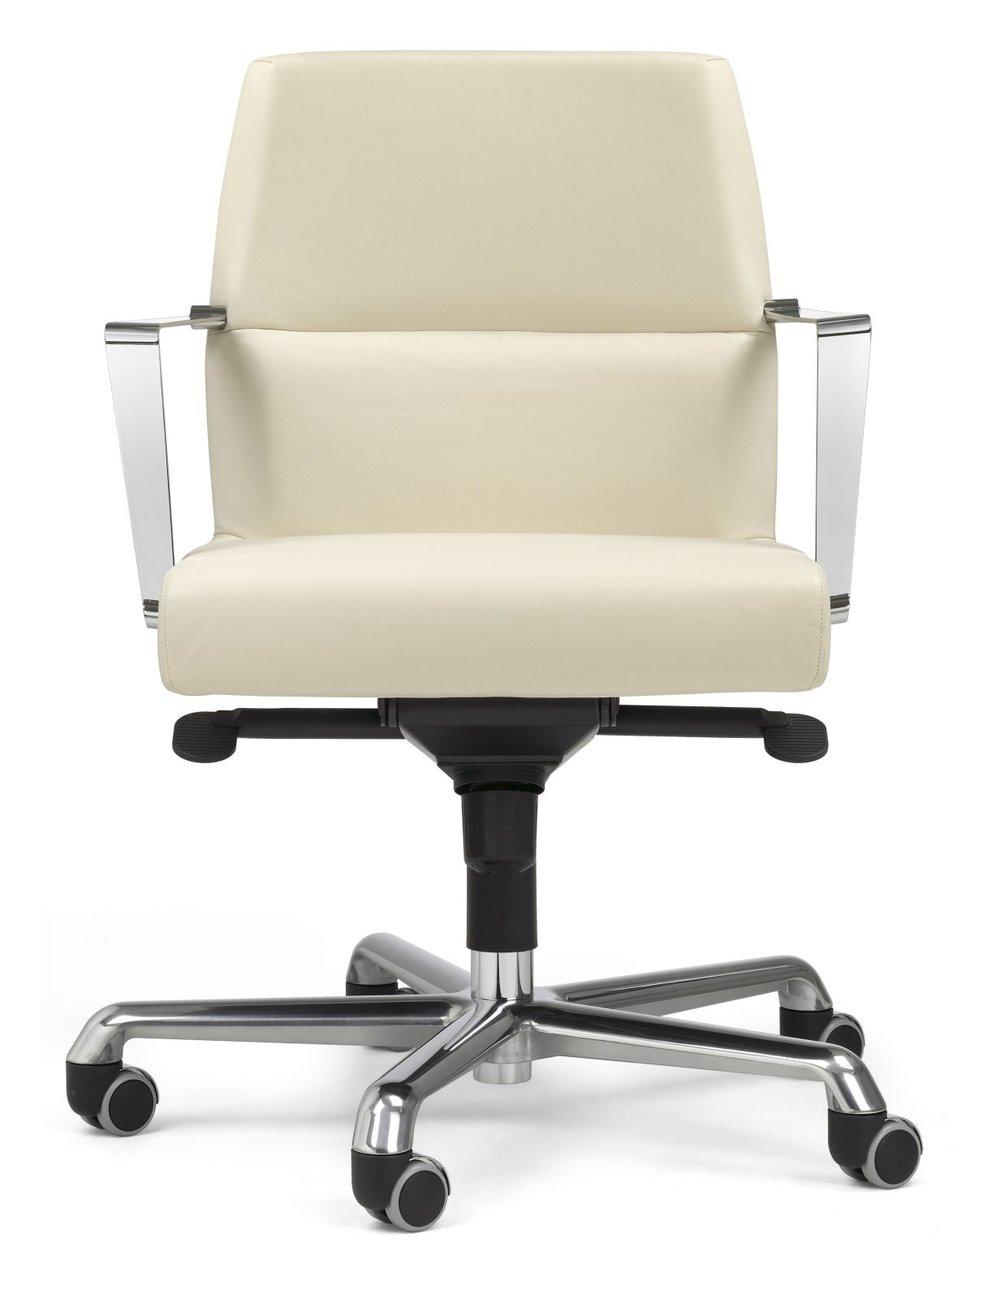 modern-office-chairs-Italian-furniture-designer-chairs (23).jpg